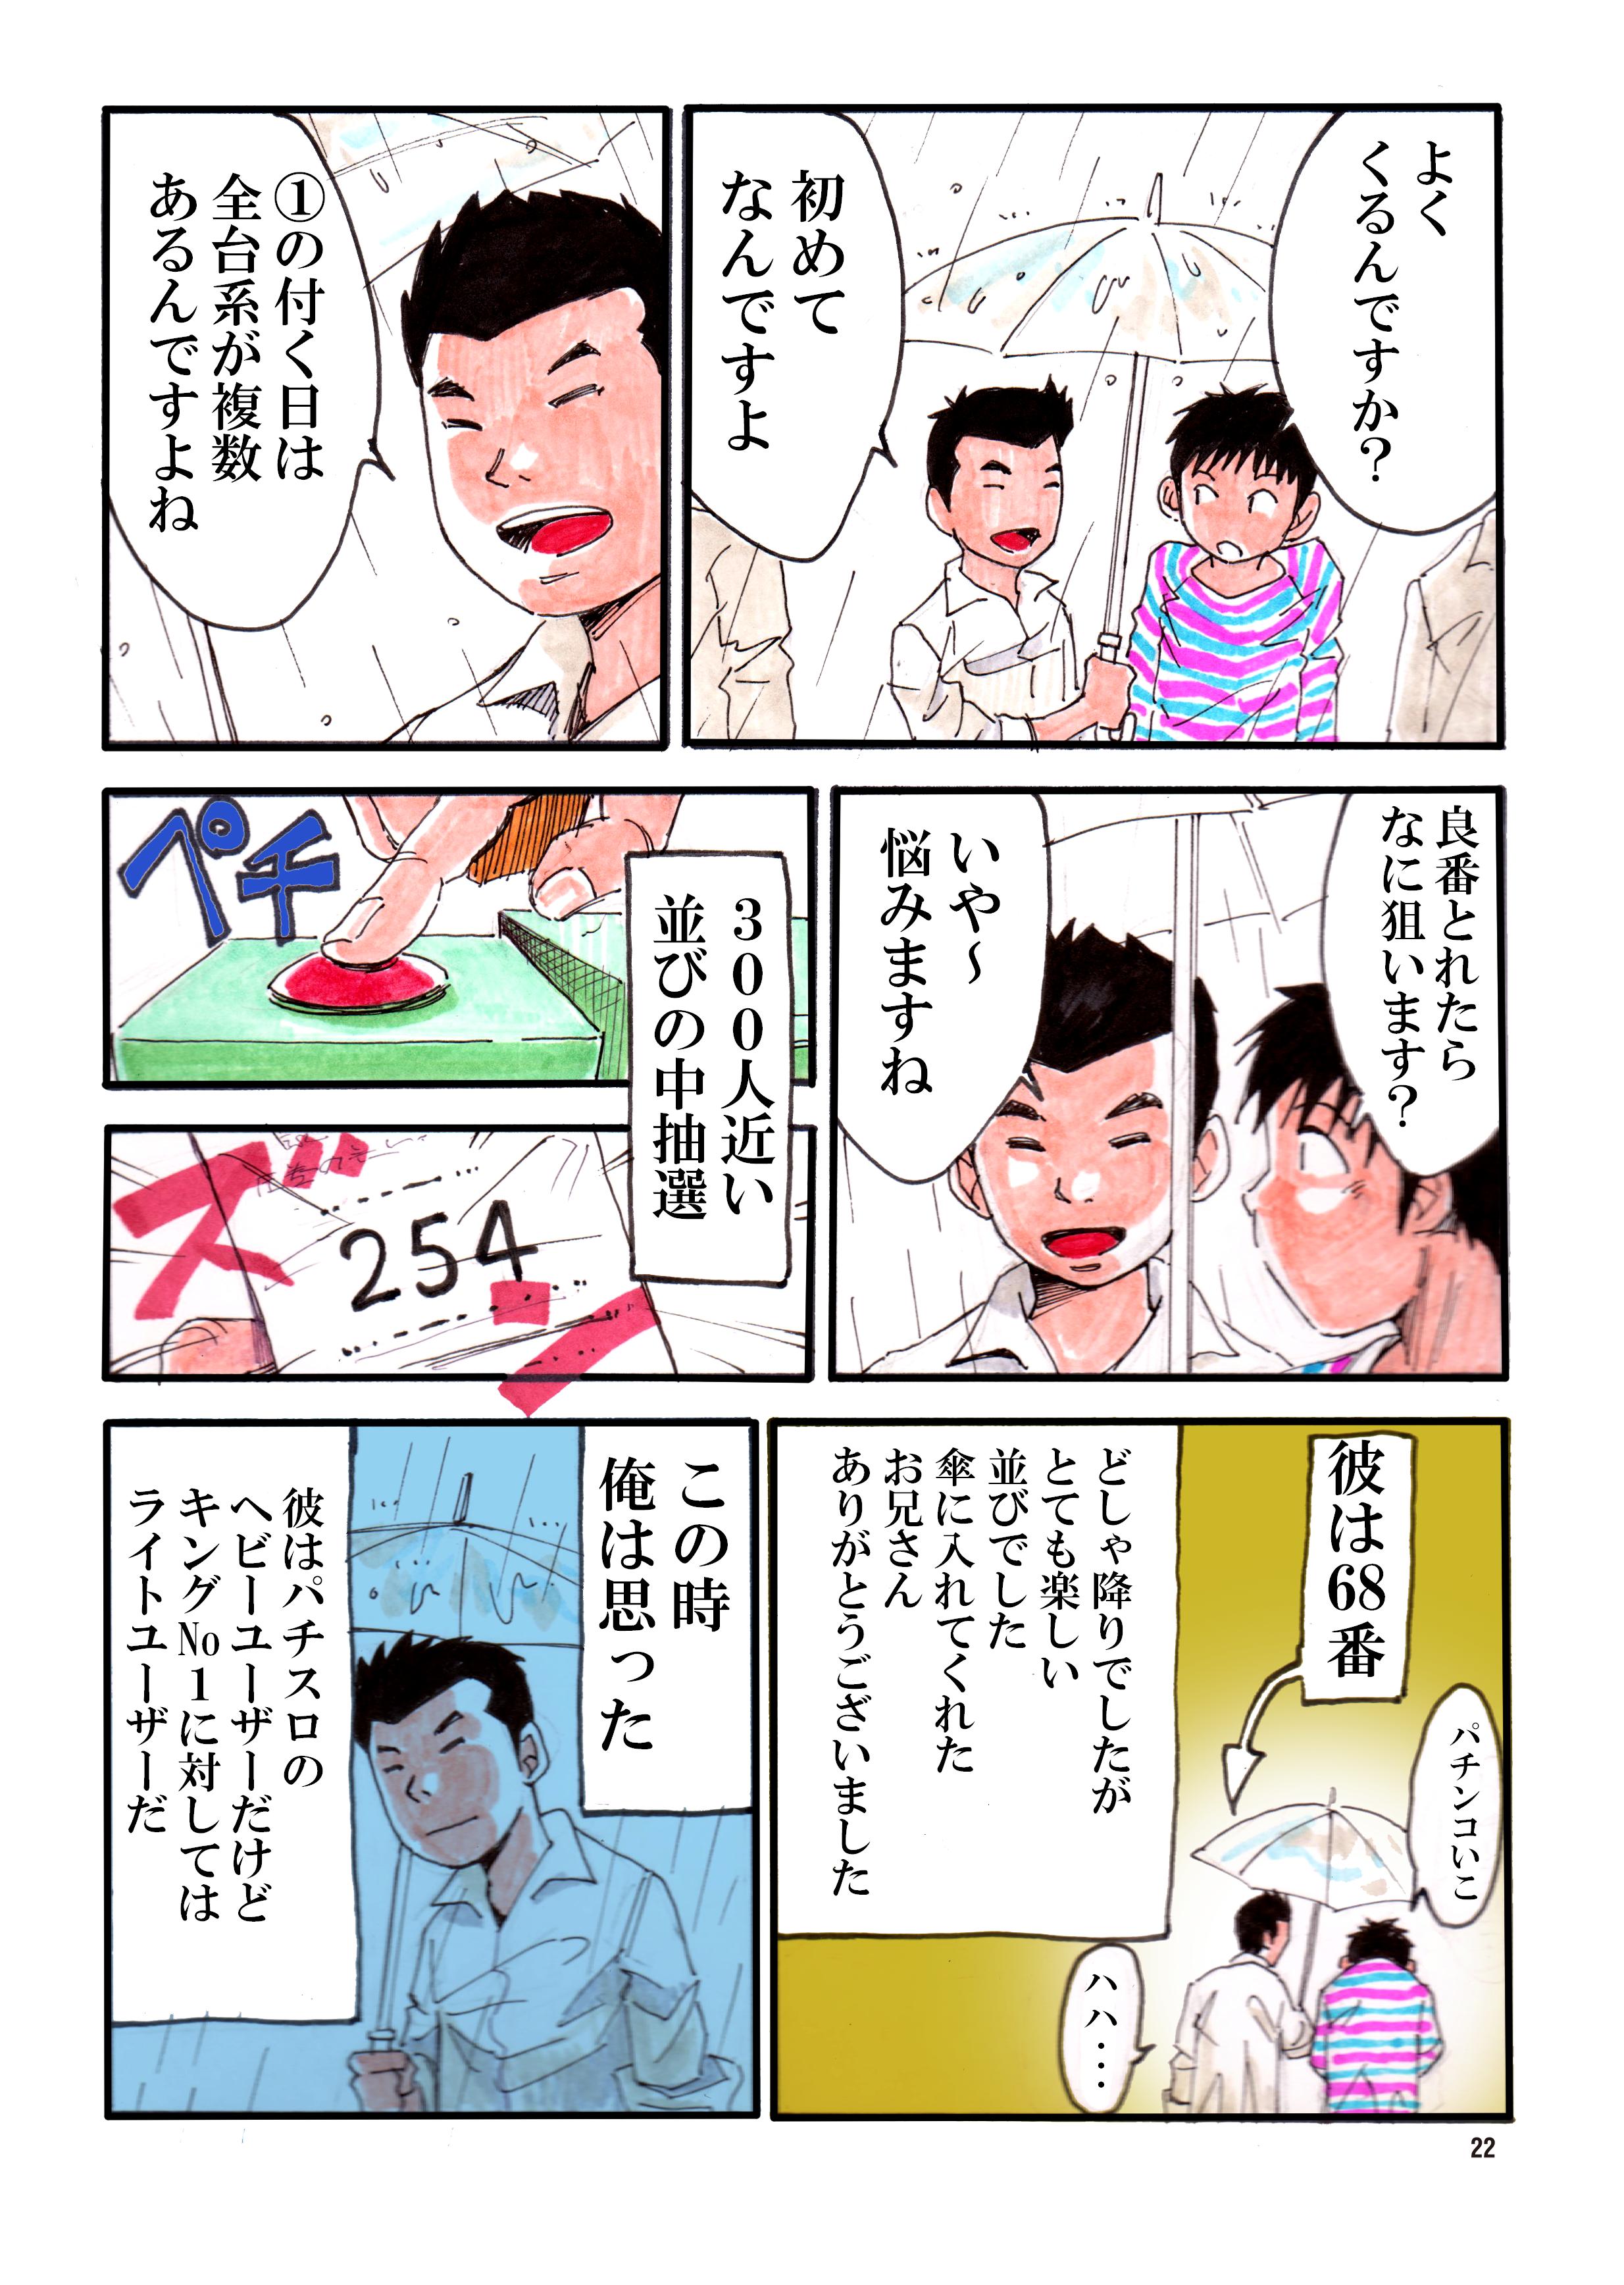 vol.5-2キング大解析